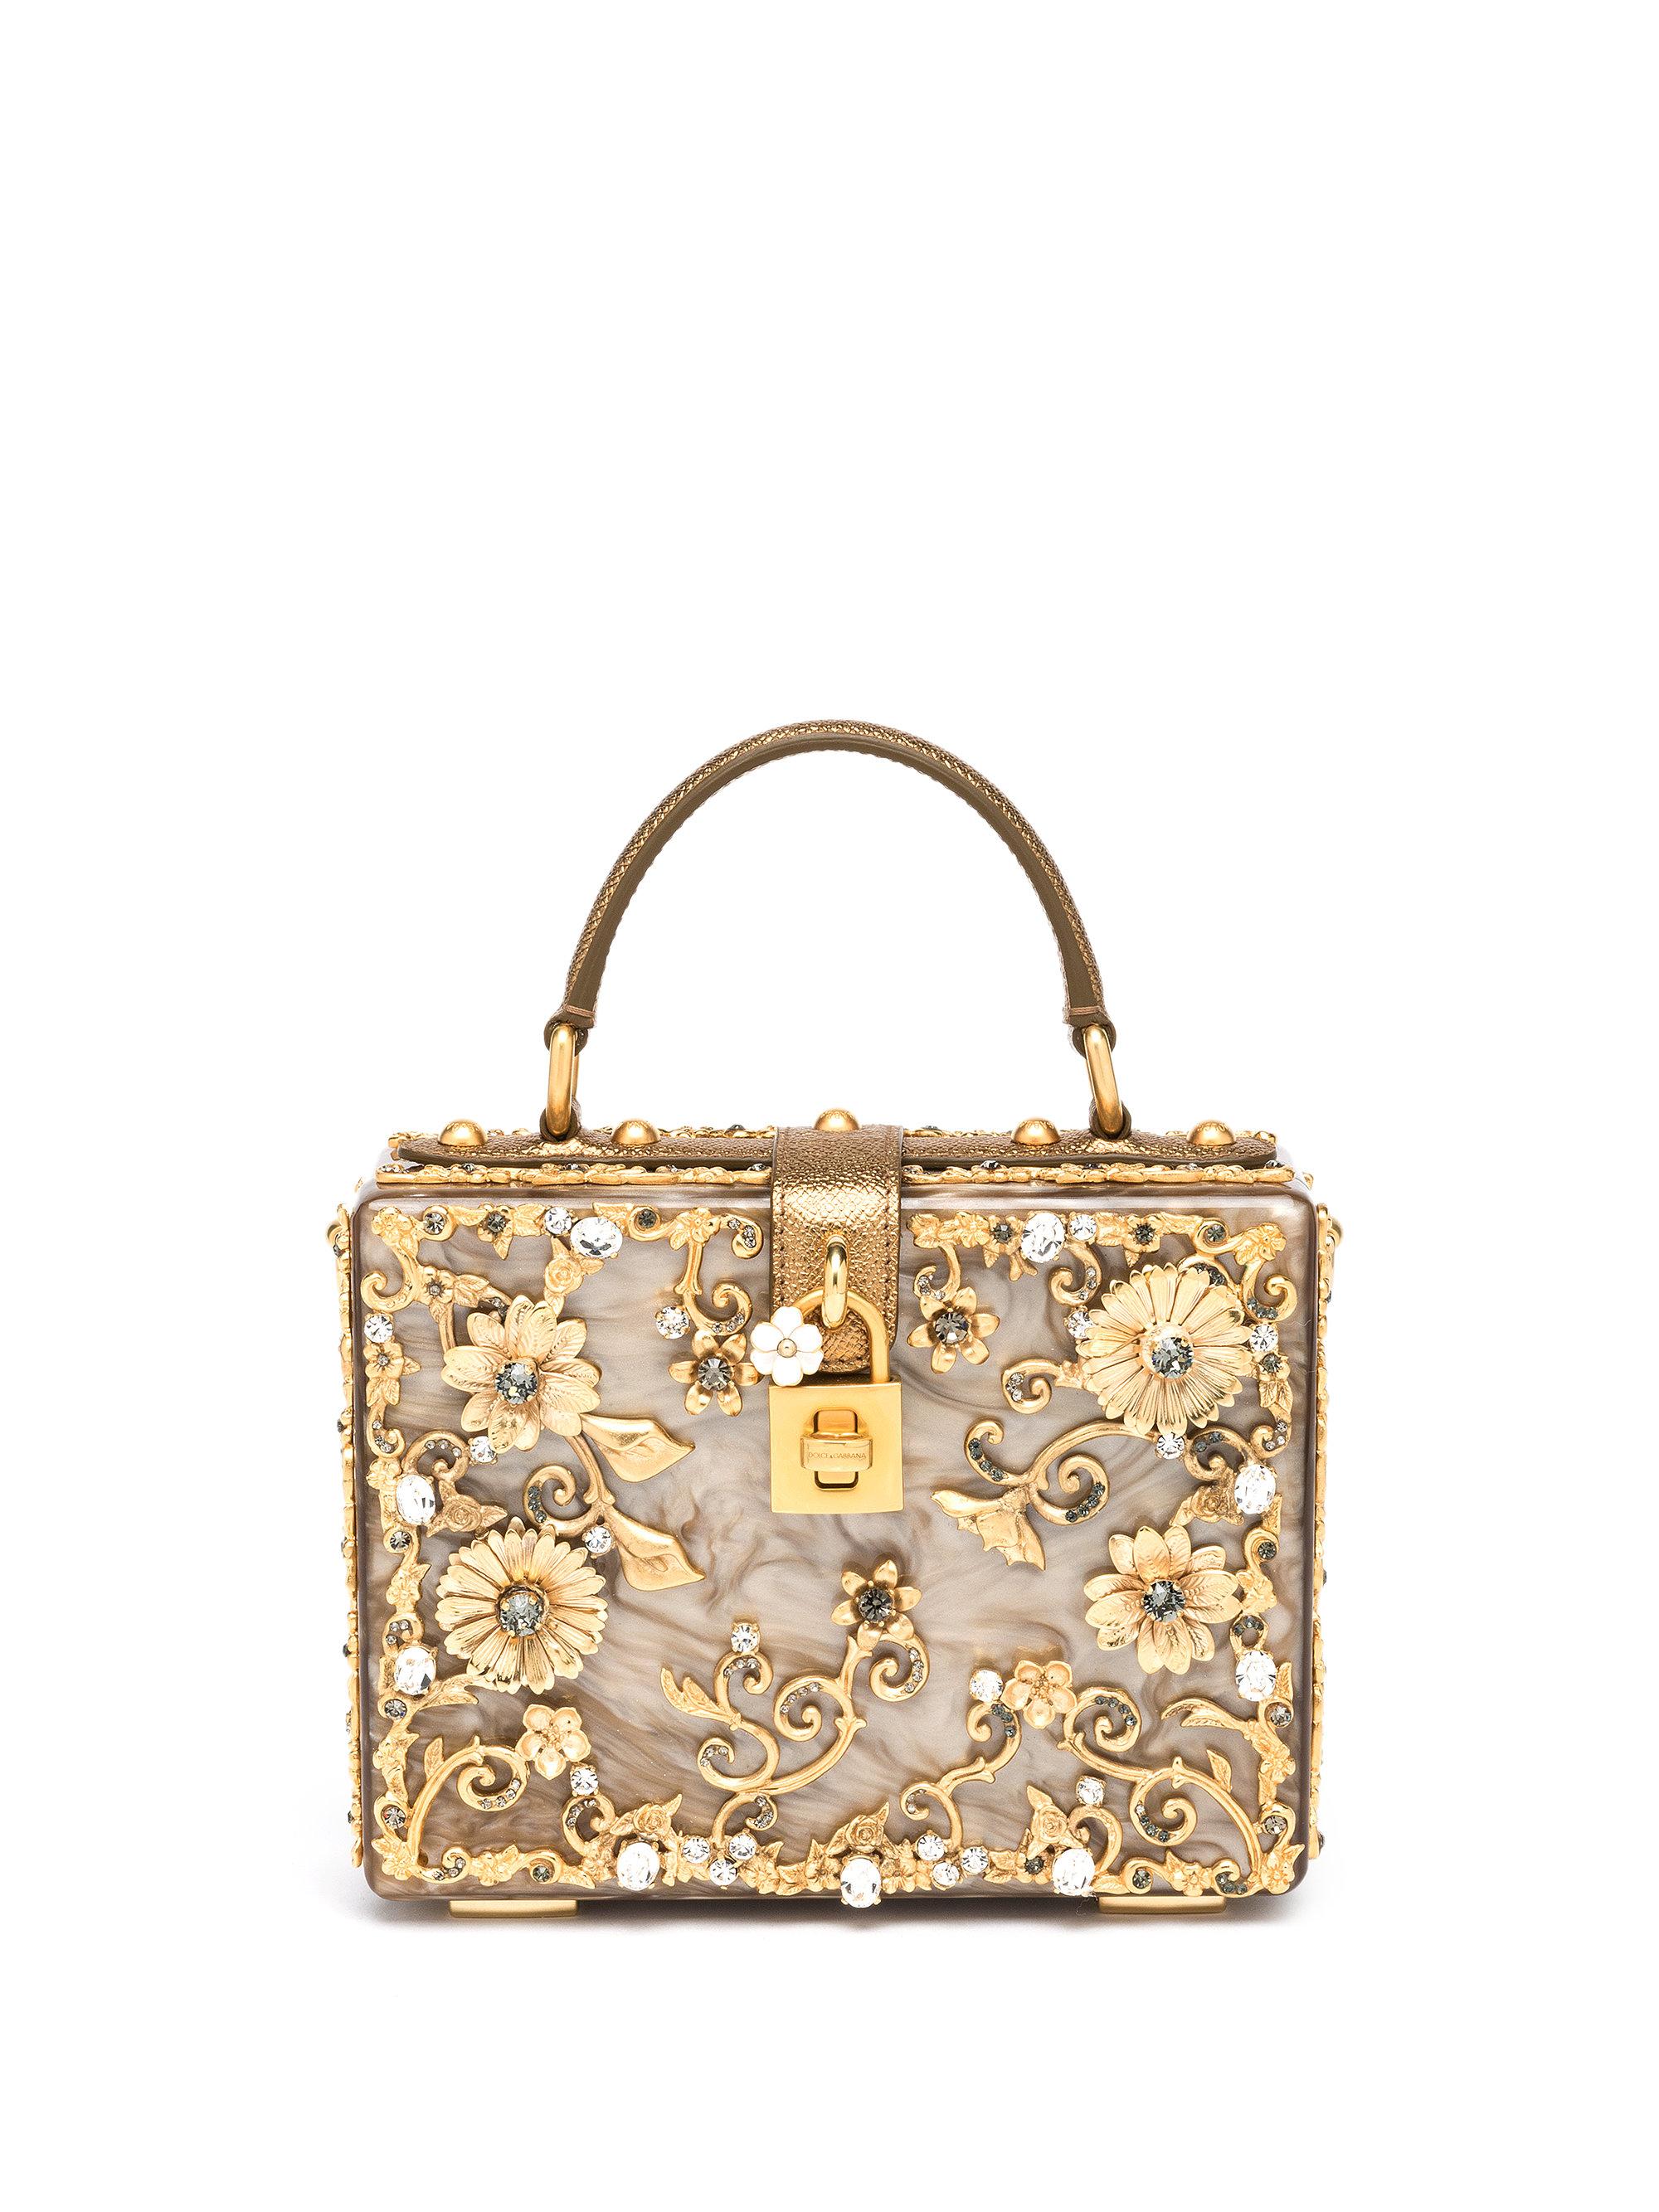 Lyst - Dolce   Gabbana Filigree Plexiglass Top-Handle Bag in Metallic 19c6d4b42a96c